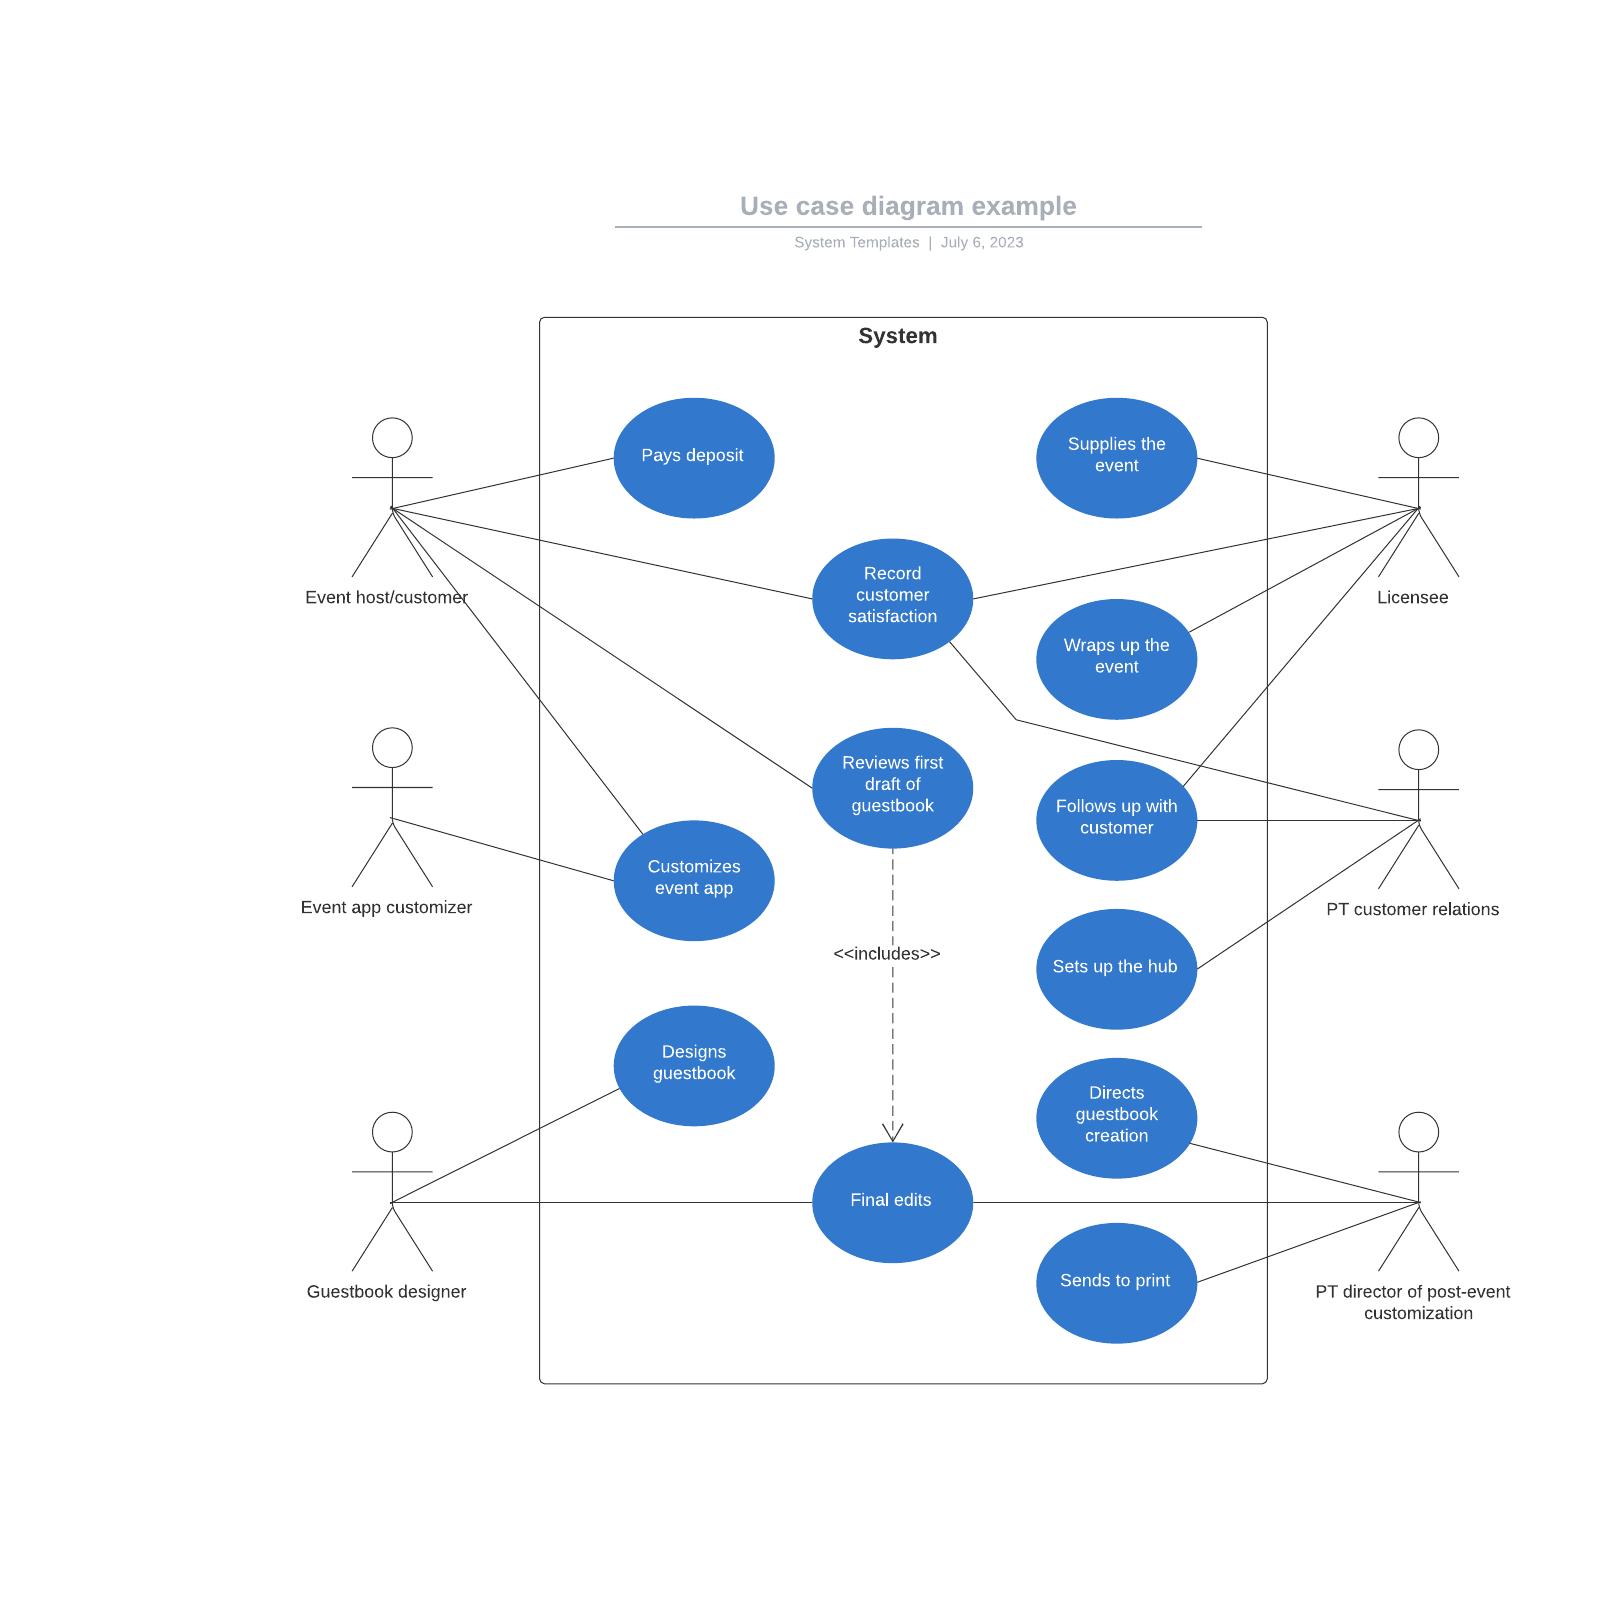 Use case diagram example